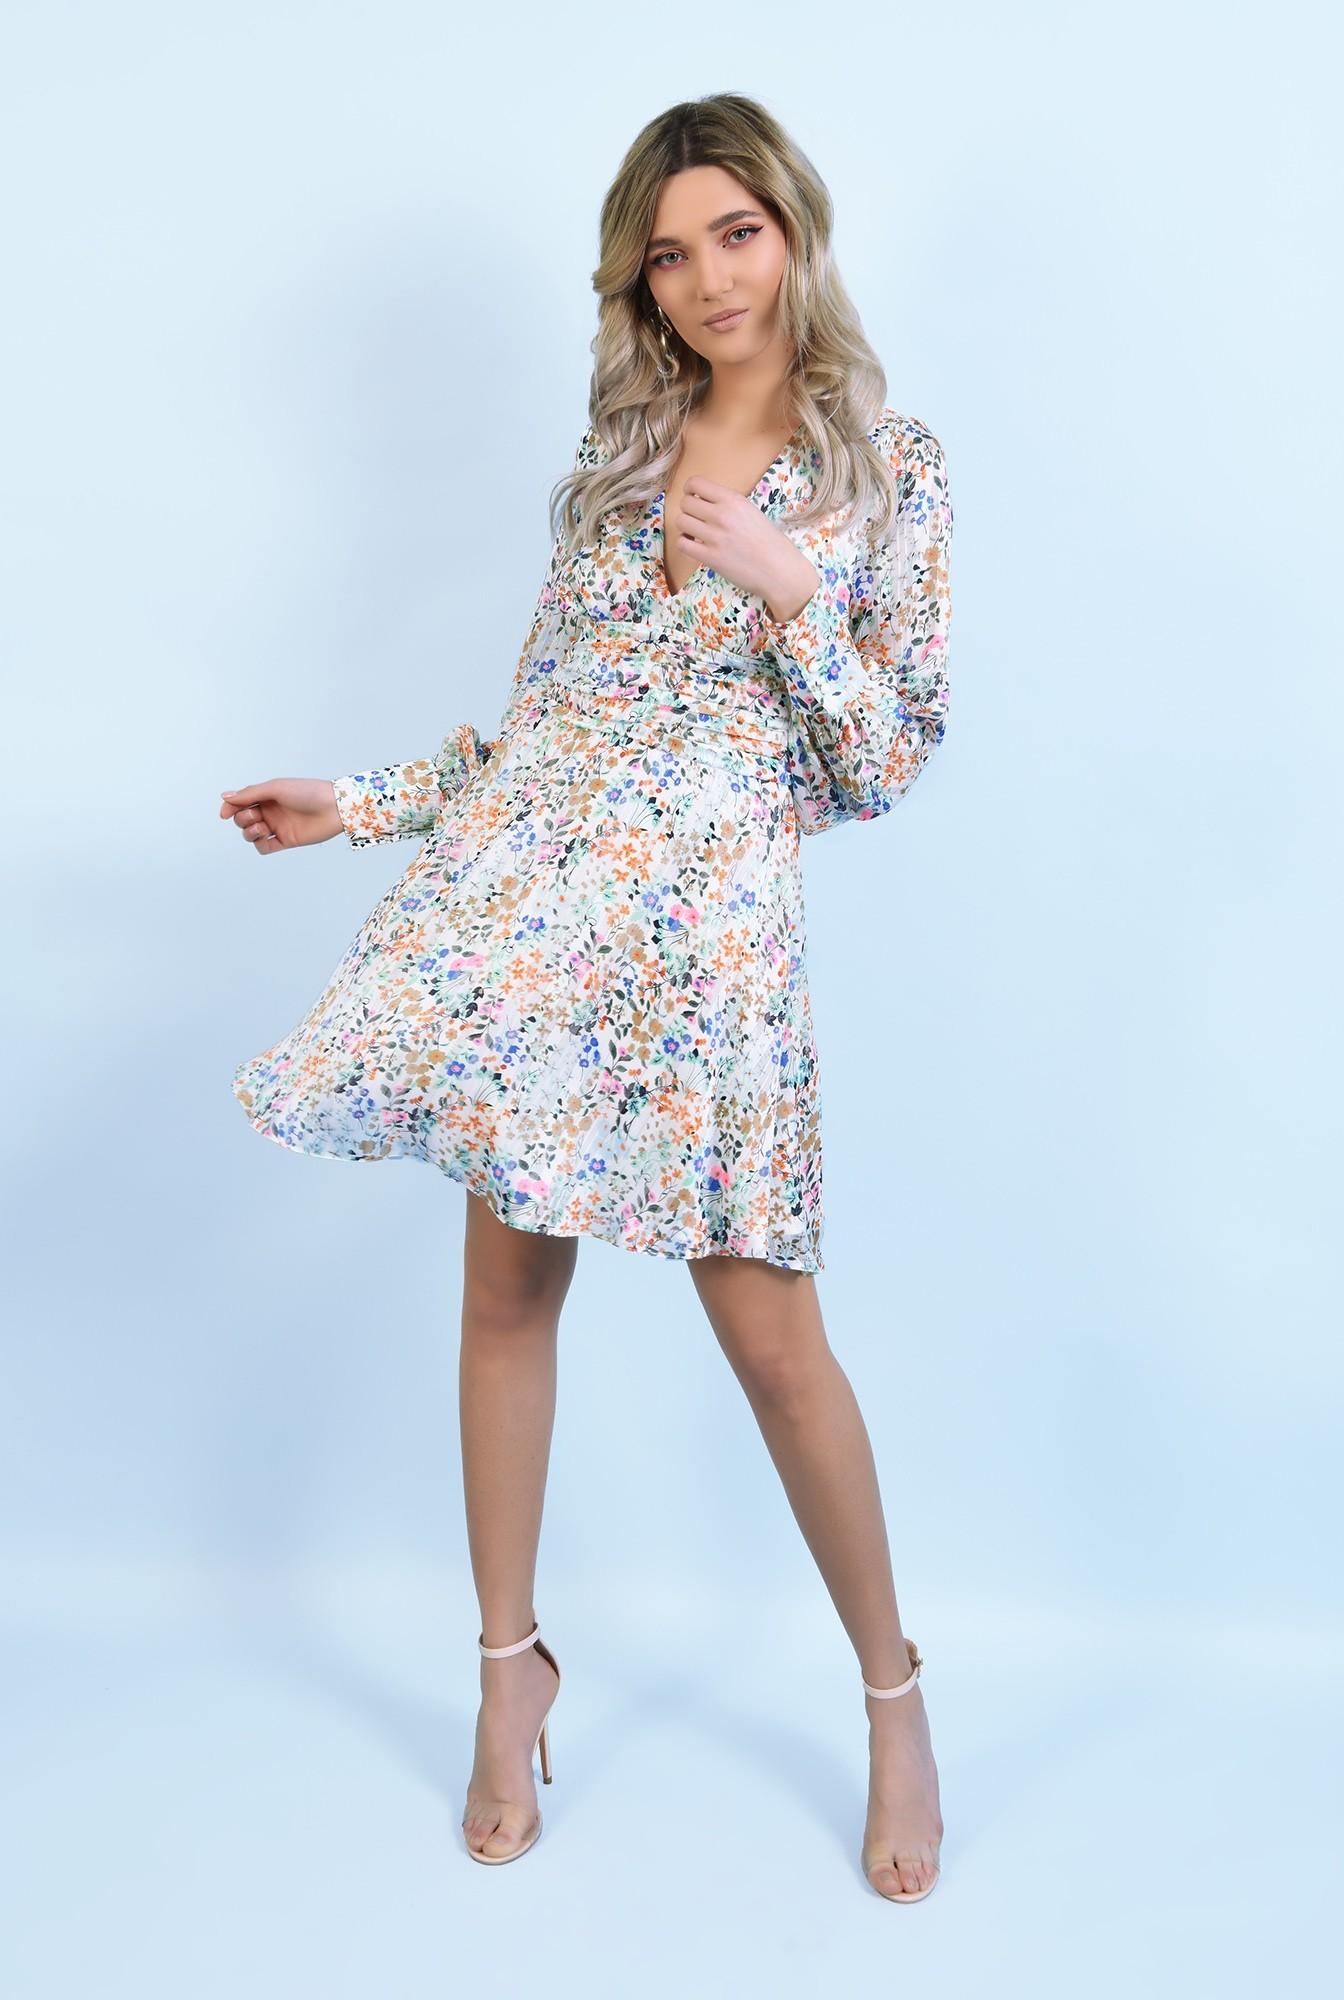 3 - 360 - rochie mini, din sifon, cu flori, maneci lungi, betelie fronsata